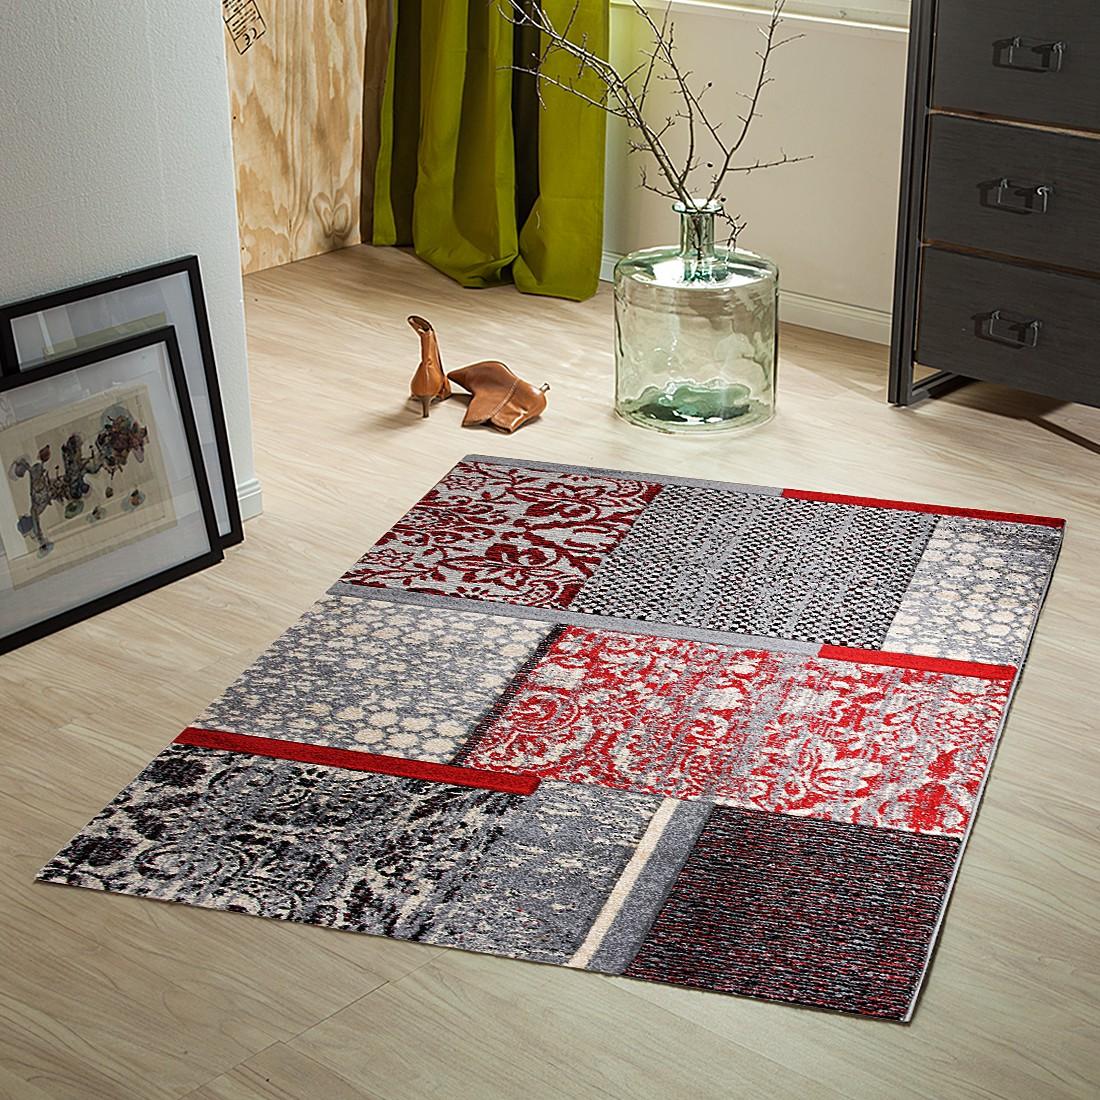 Teppich Liam Karomuster – Rot / Grau – 80 x 150 cm, Testil online bestellen